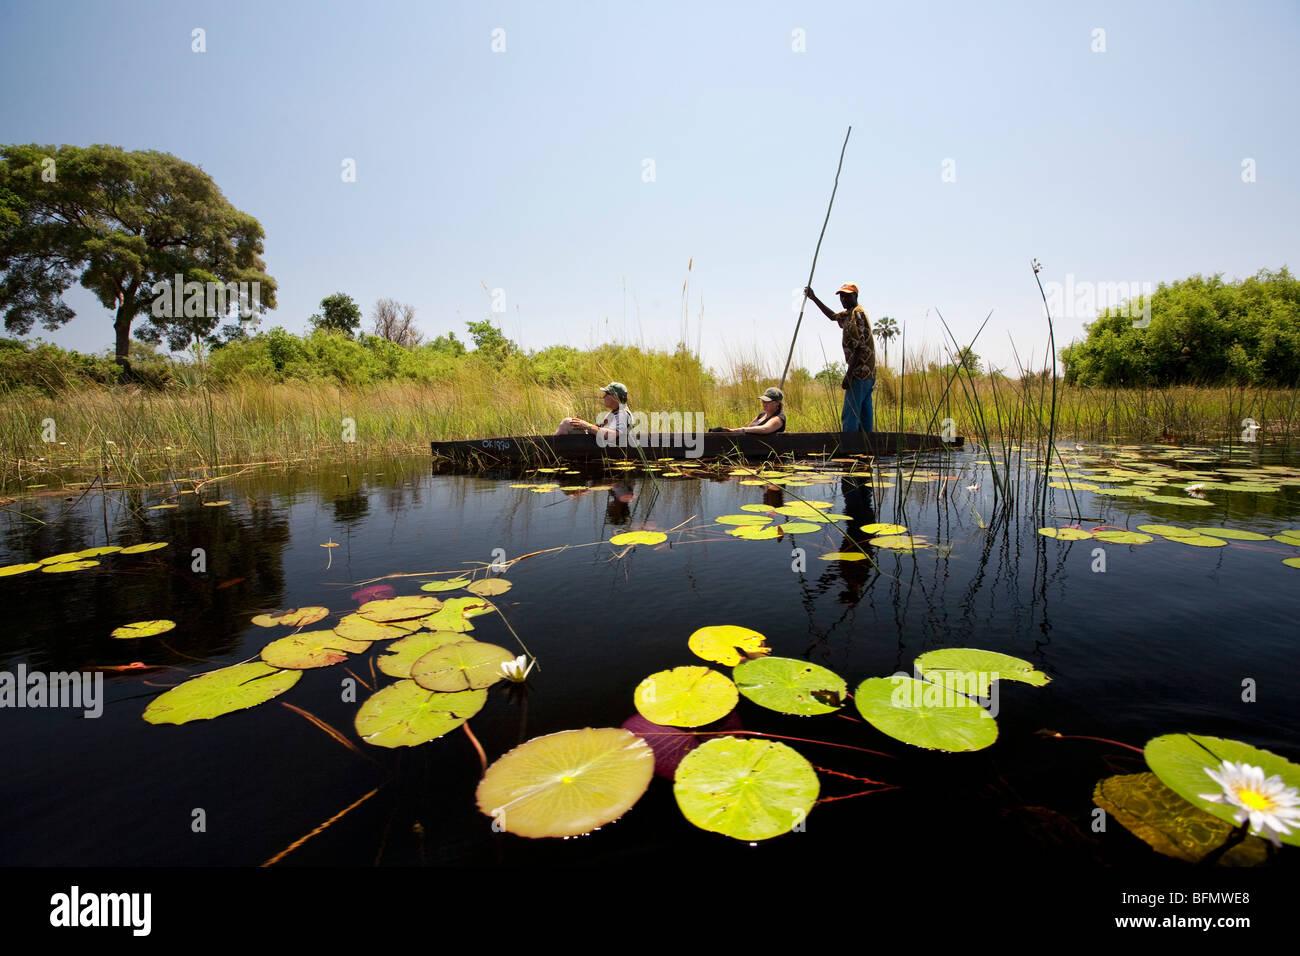 Botswana, Okavango Delta. A local guide punts a mokoro through the channels of the Okavango Delta - Stock Image